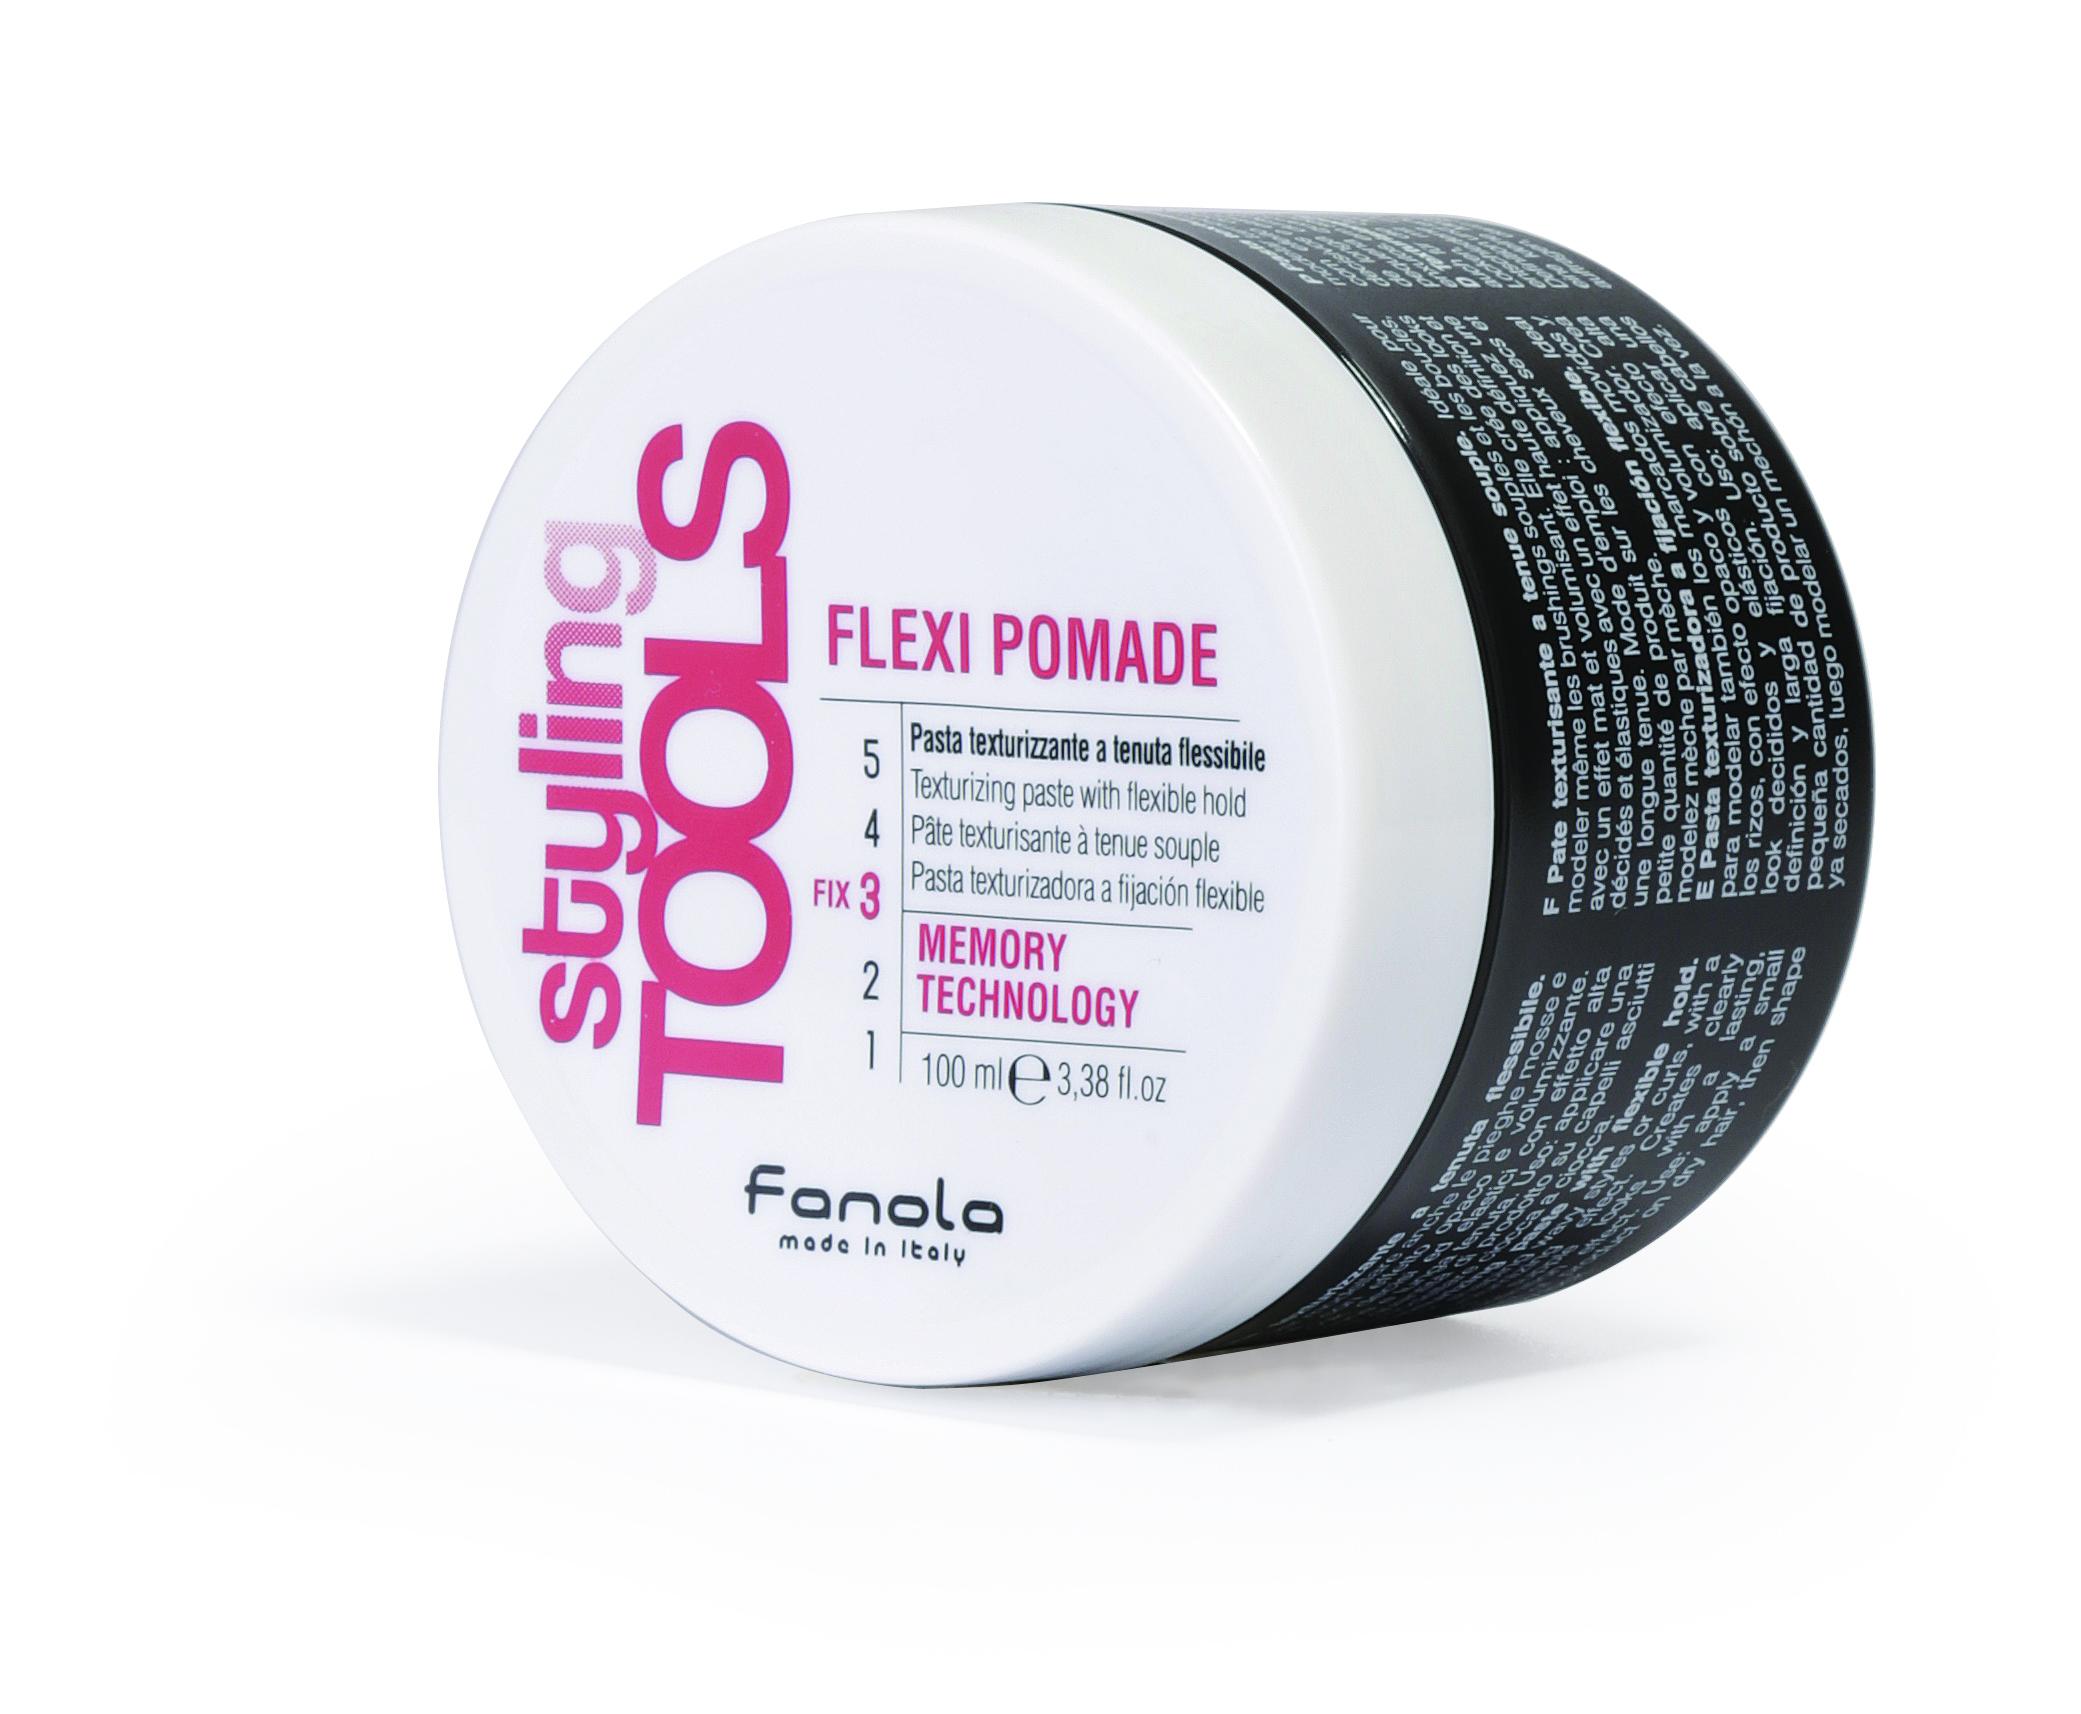 Fanola Styling Tools  Flexi Pomade - pasta pre textúru a flexibilnú fixáciu,100 ml